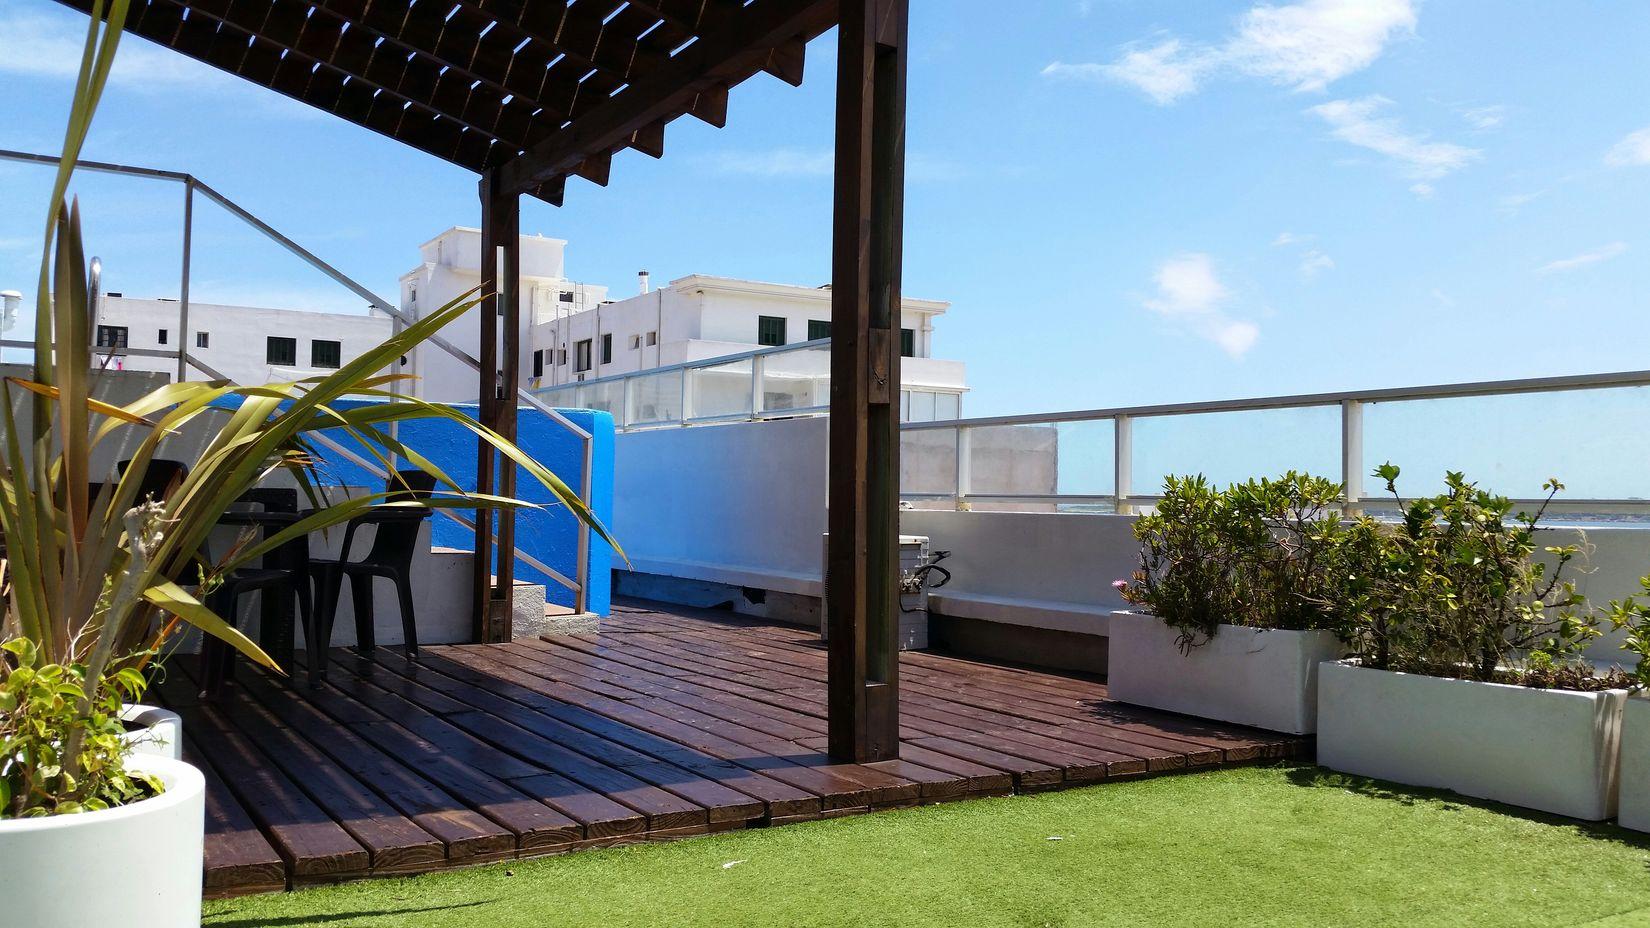 Piscina Enjoying Life Relaxing Disfrutando. Punta Del Este Uruguay